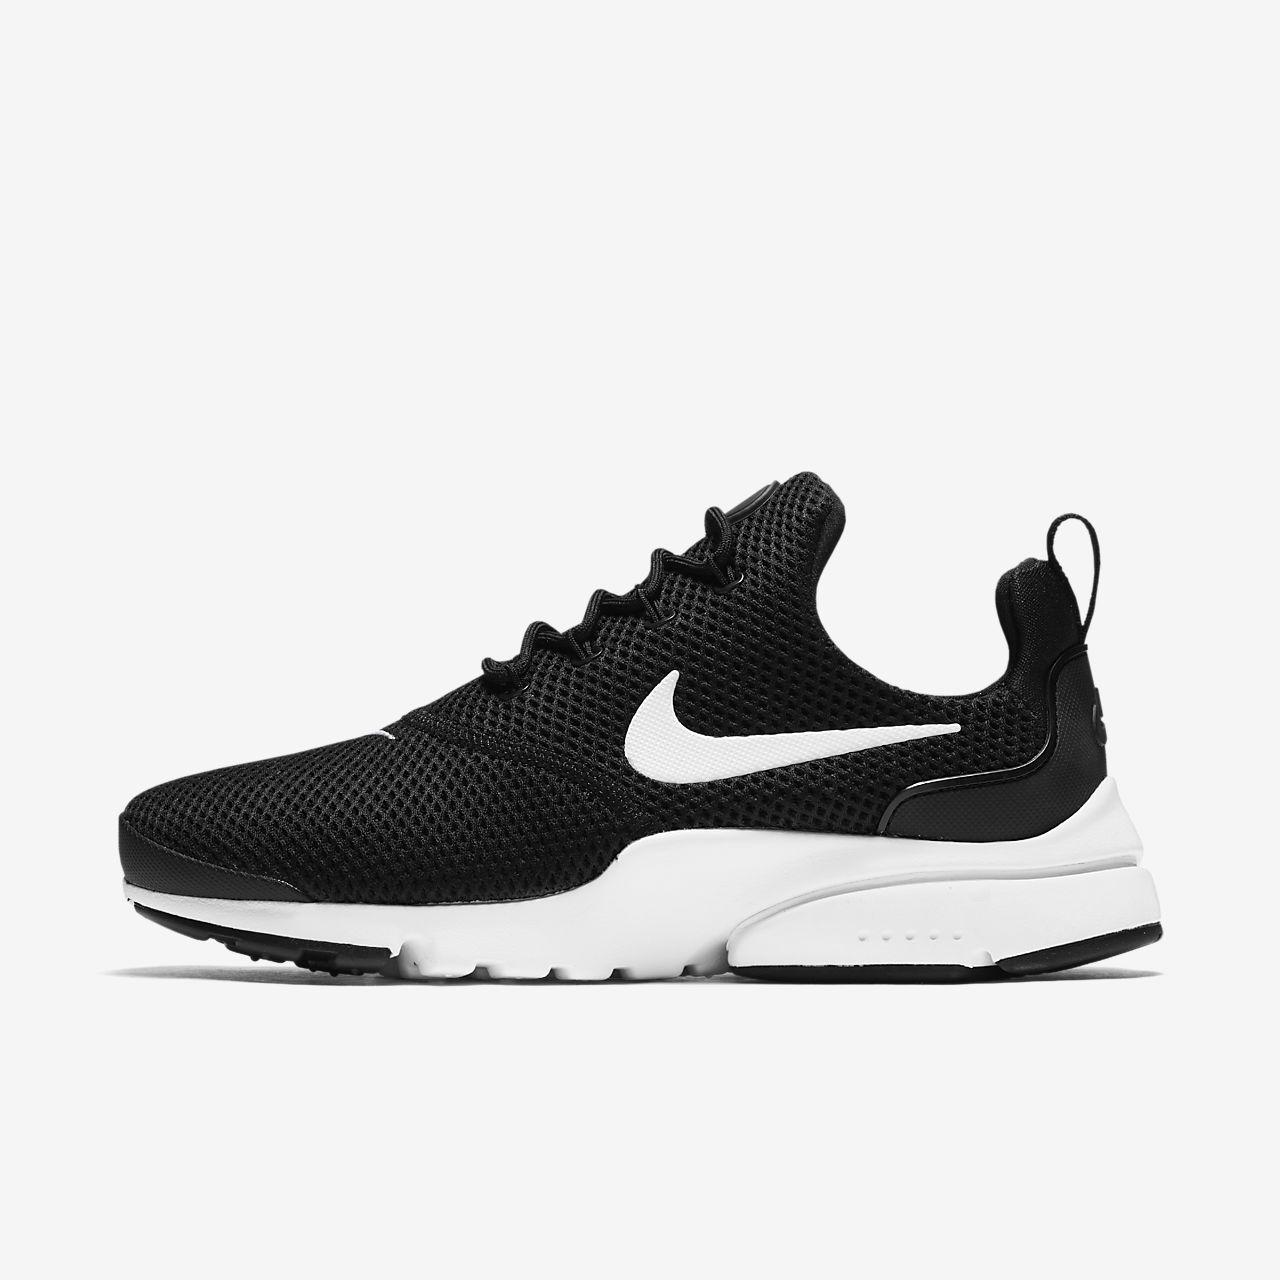 04c89c3e374b Nike Presto Fly Women s Shoe. Nike.com RO